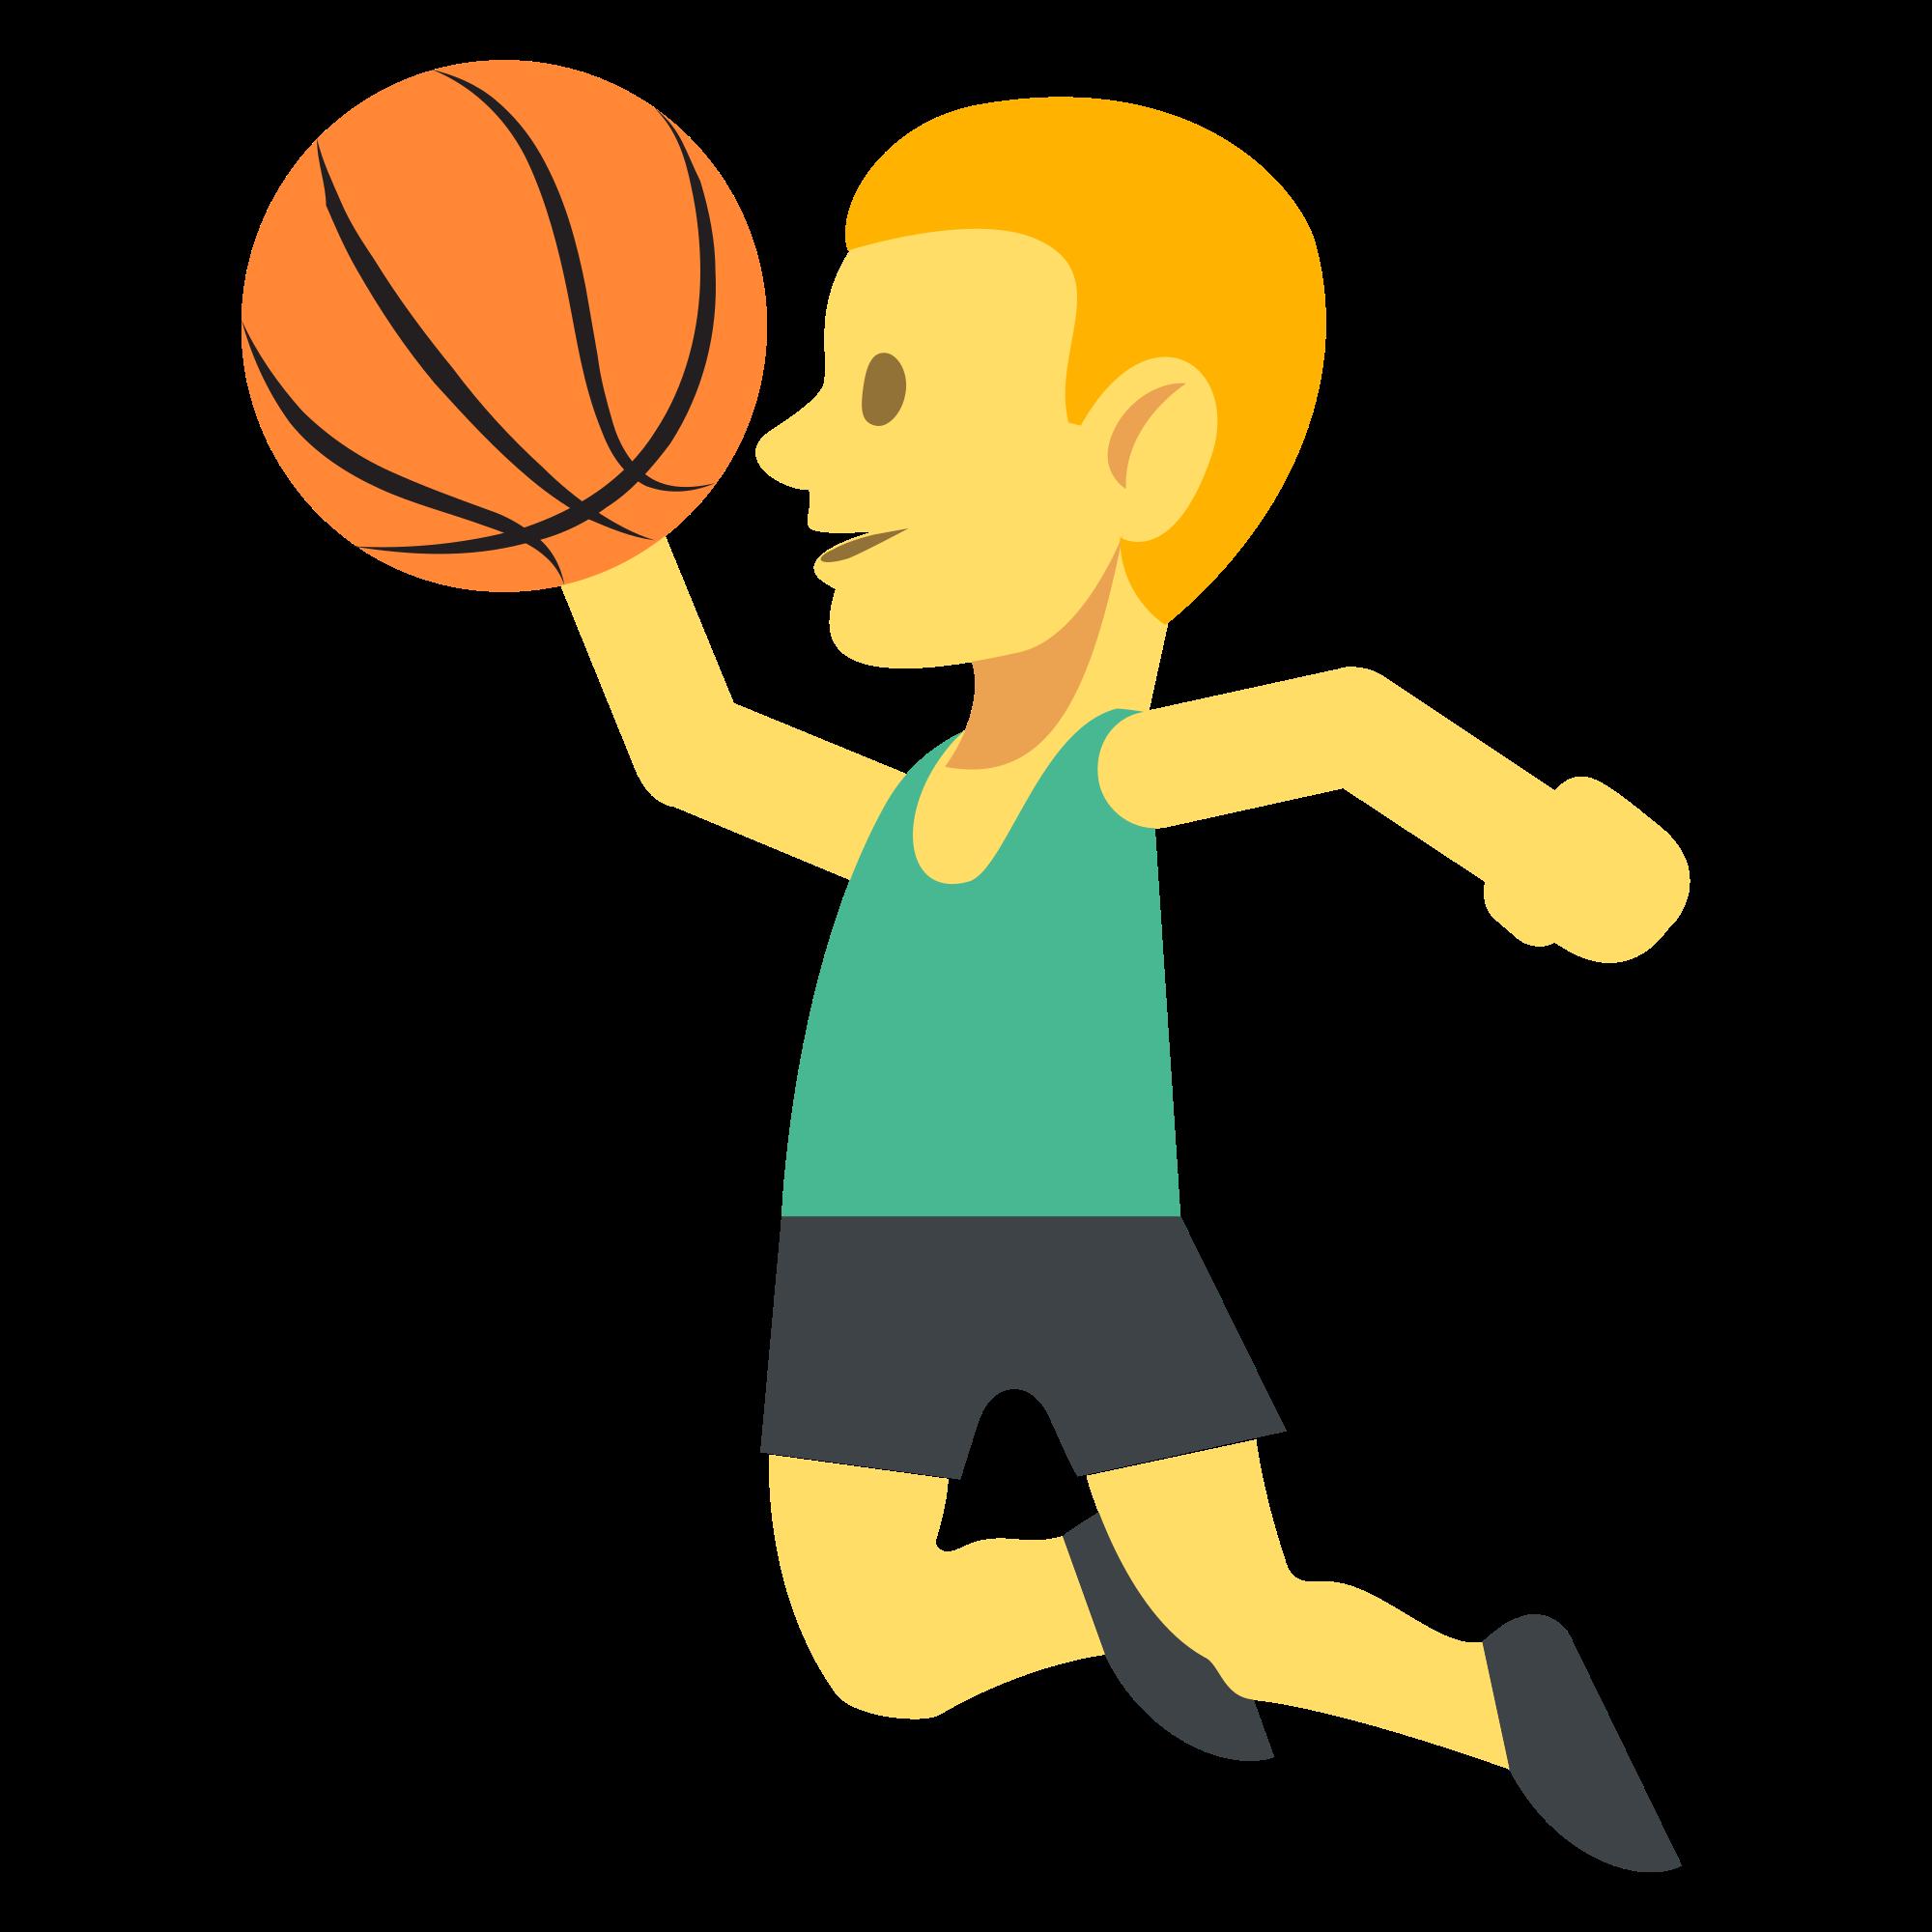 Volleyball clipart emoji. File emojione f svg